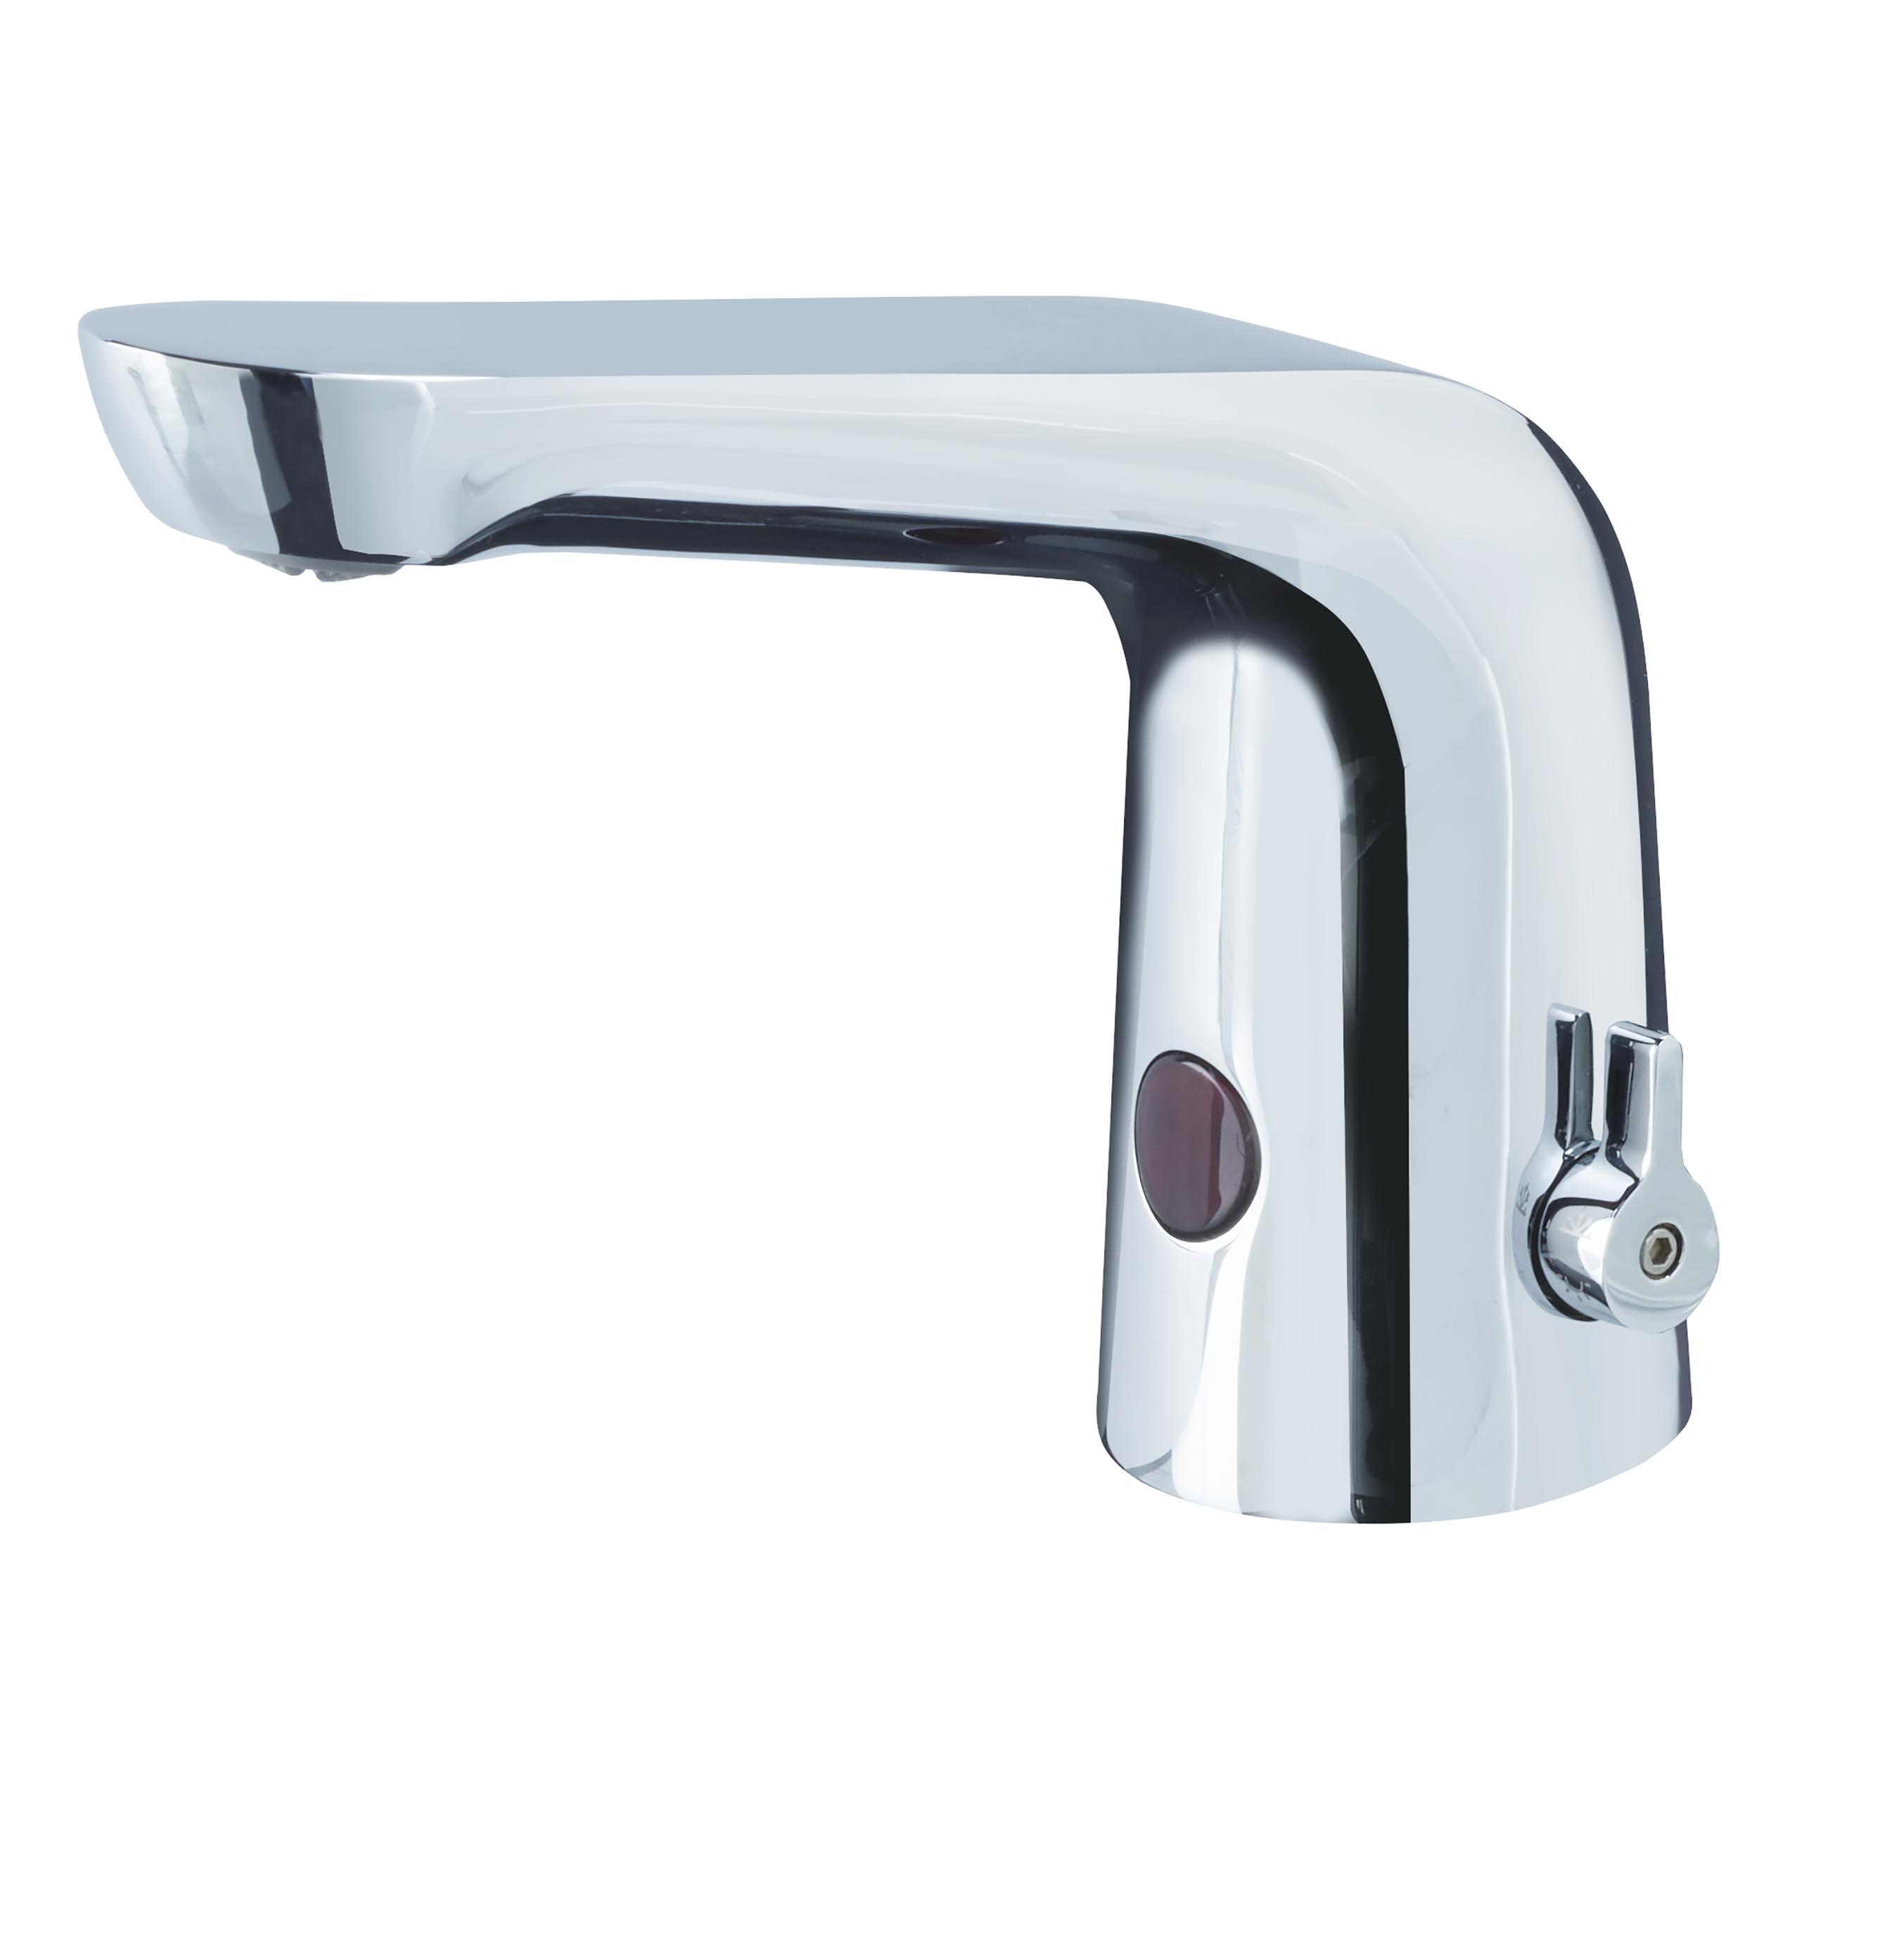 Bristan Infrared Temperature Control Basin Spout - Chrome